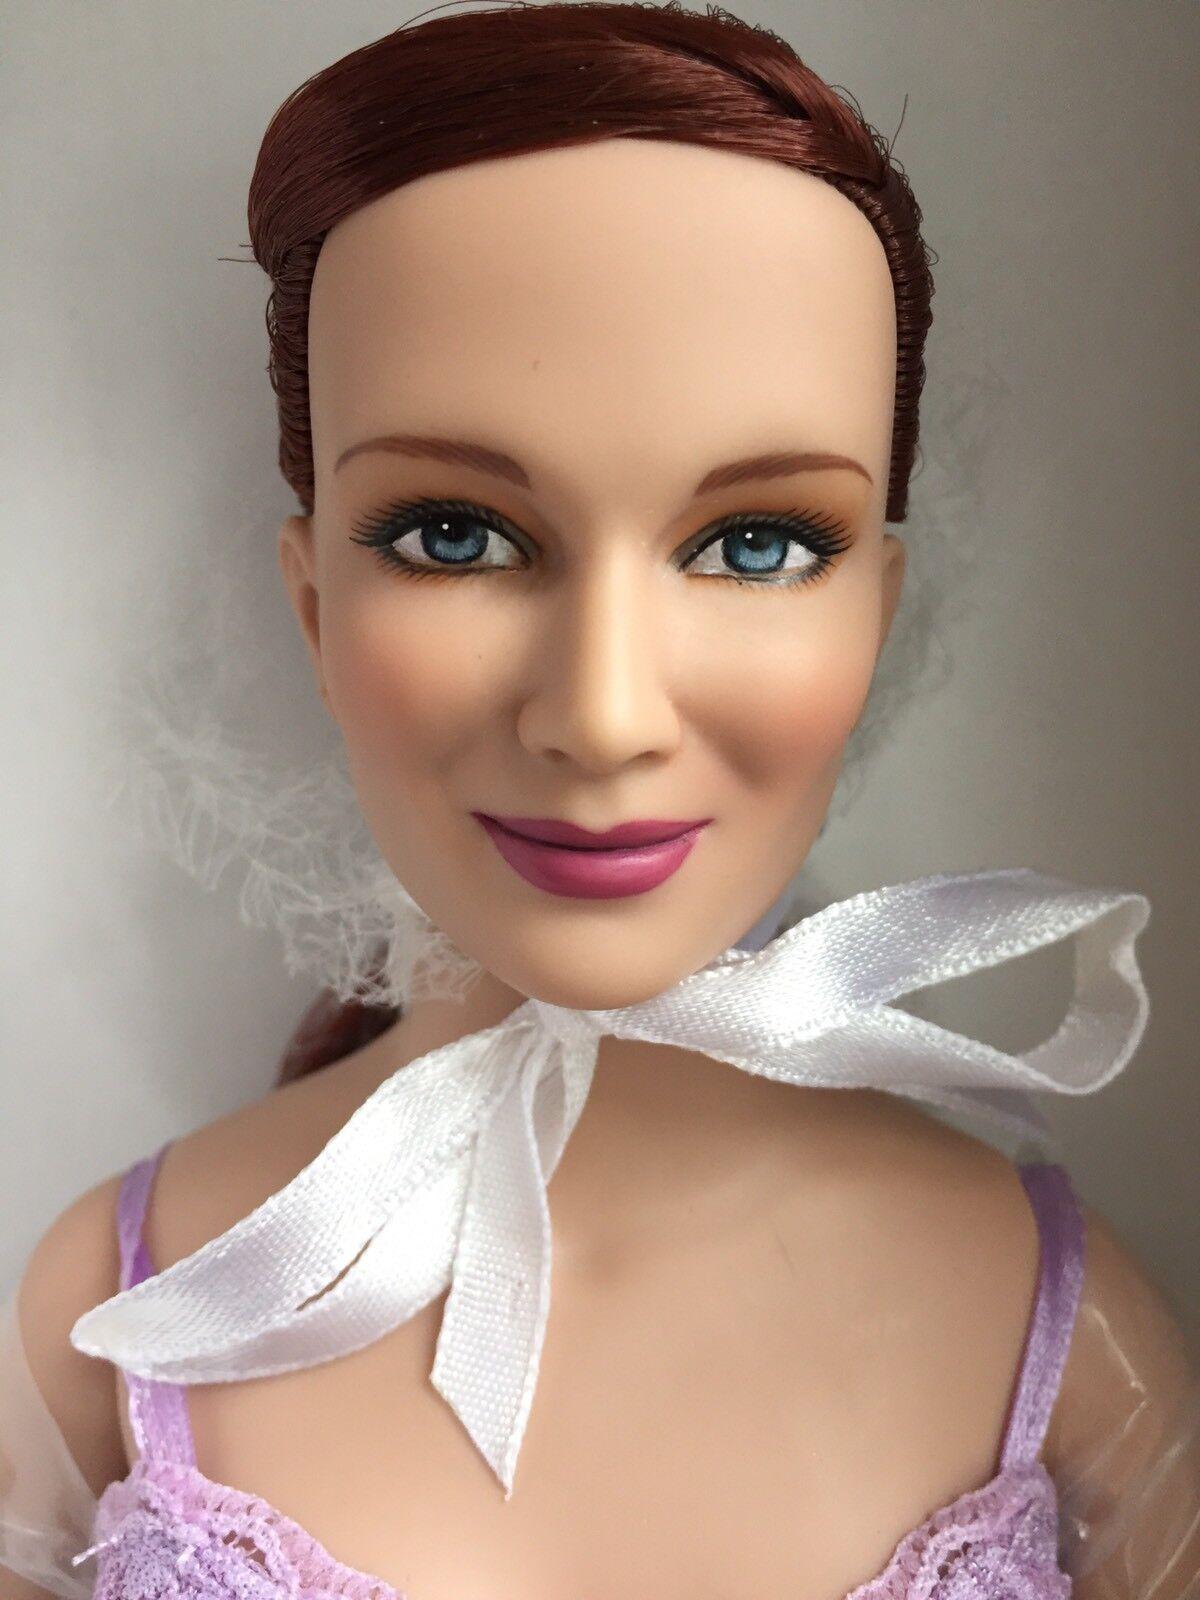 Tonner TYLER 16  2006 EMME BASIC rotHEAD Fashion Doll NRFB Full Figurot Body